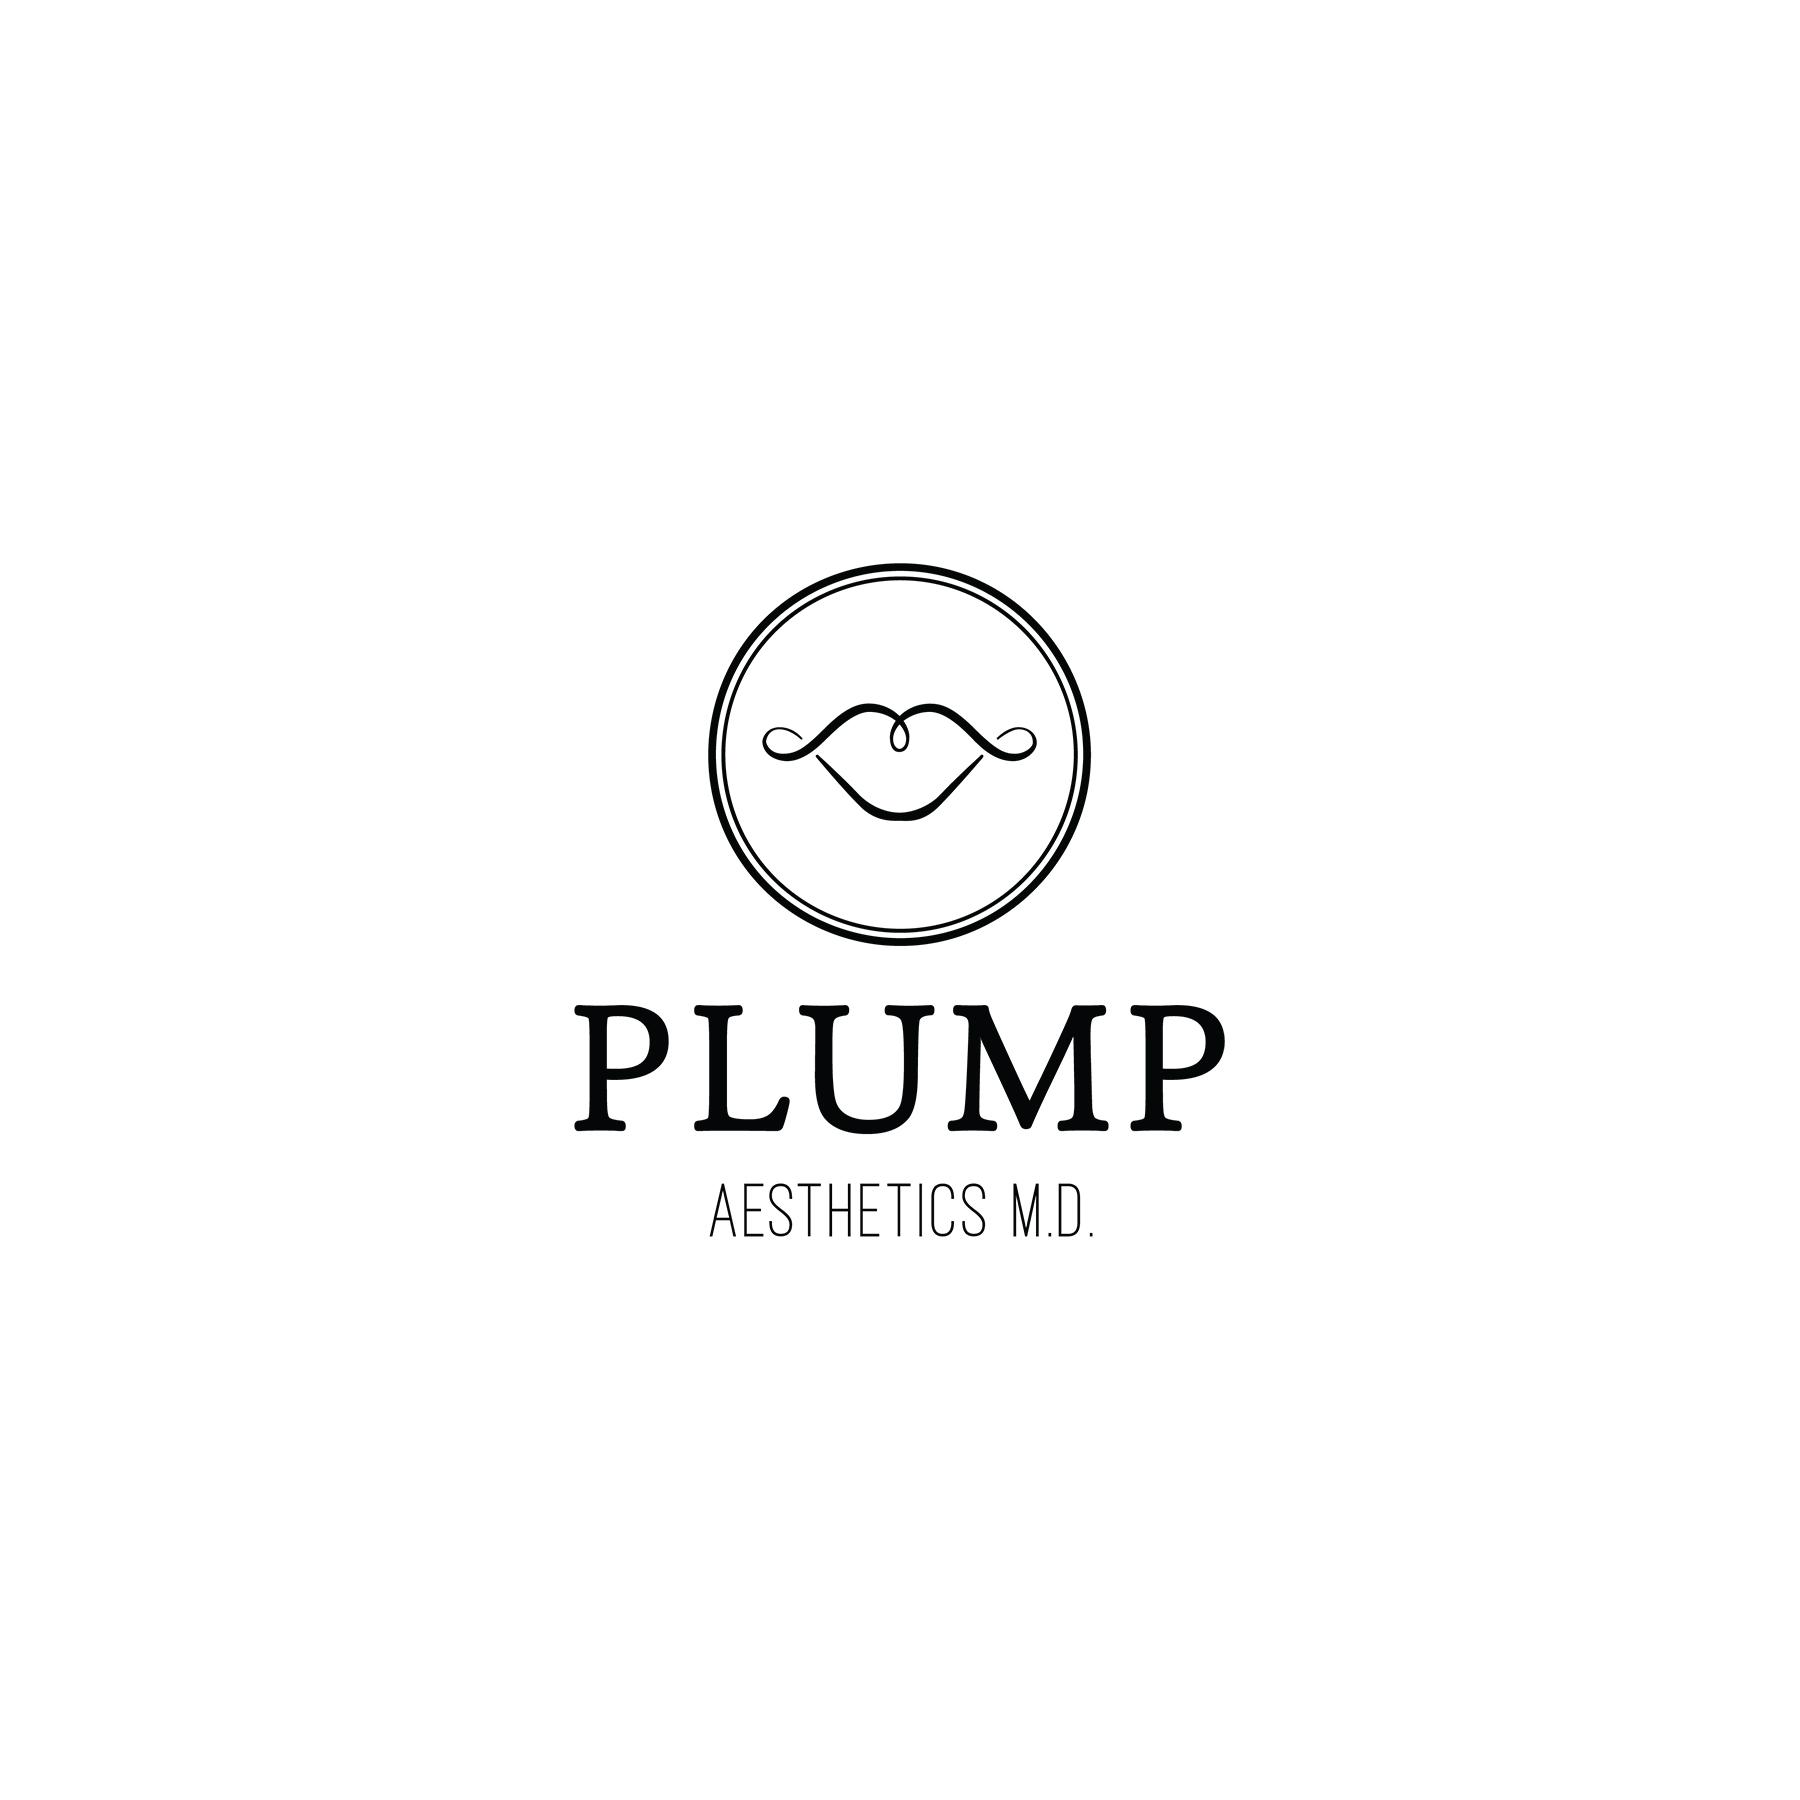 plump aesthetics md